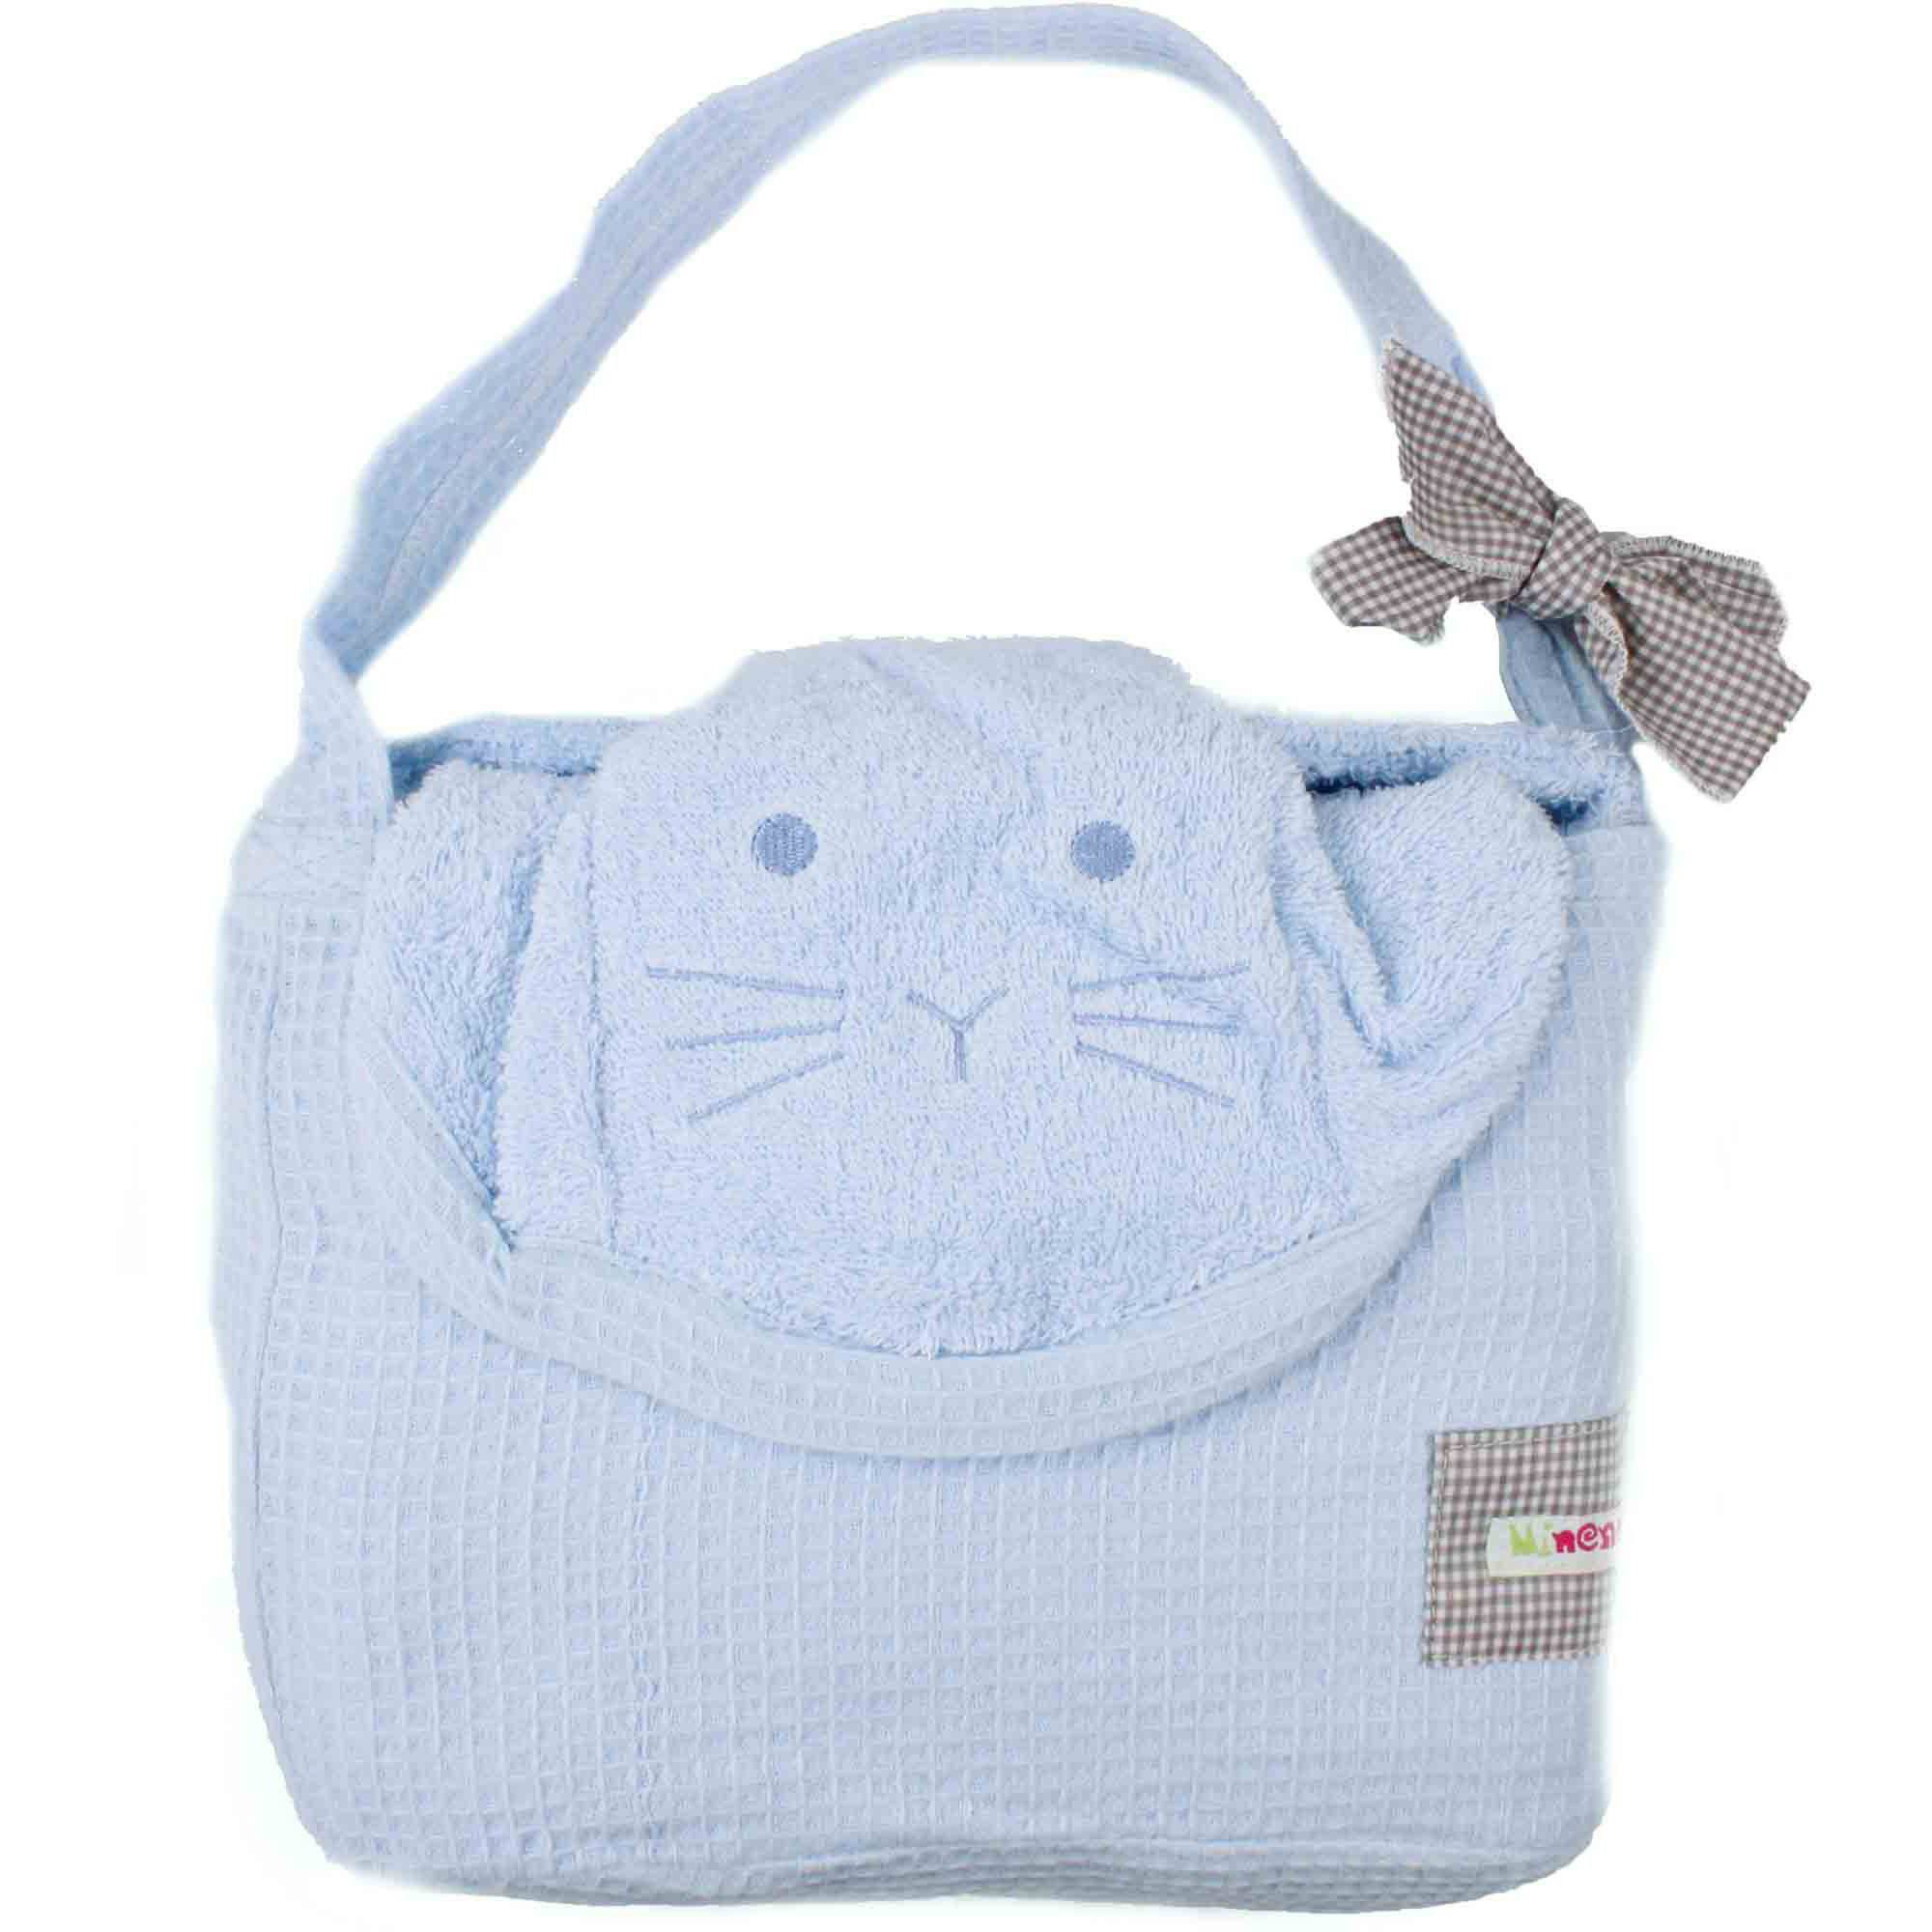 Minene Cuddly Towel, Light Blue Dog